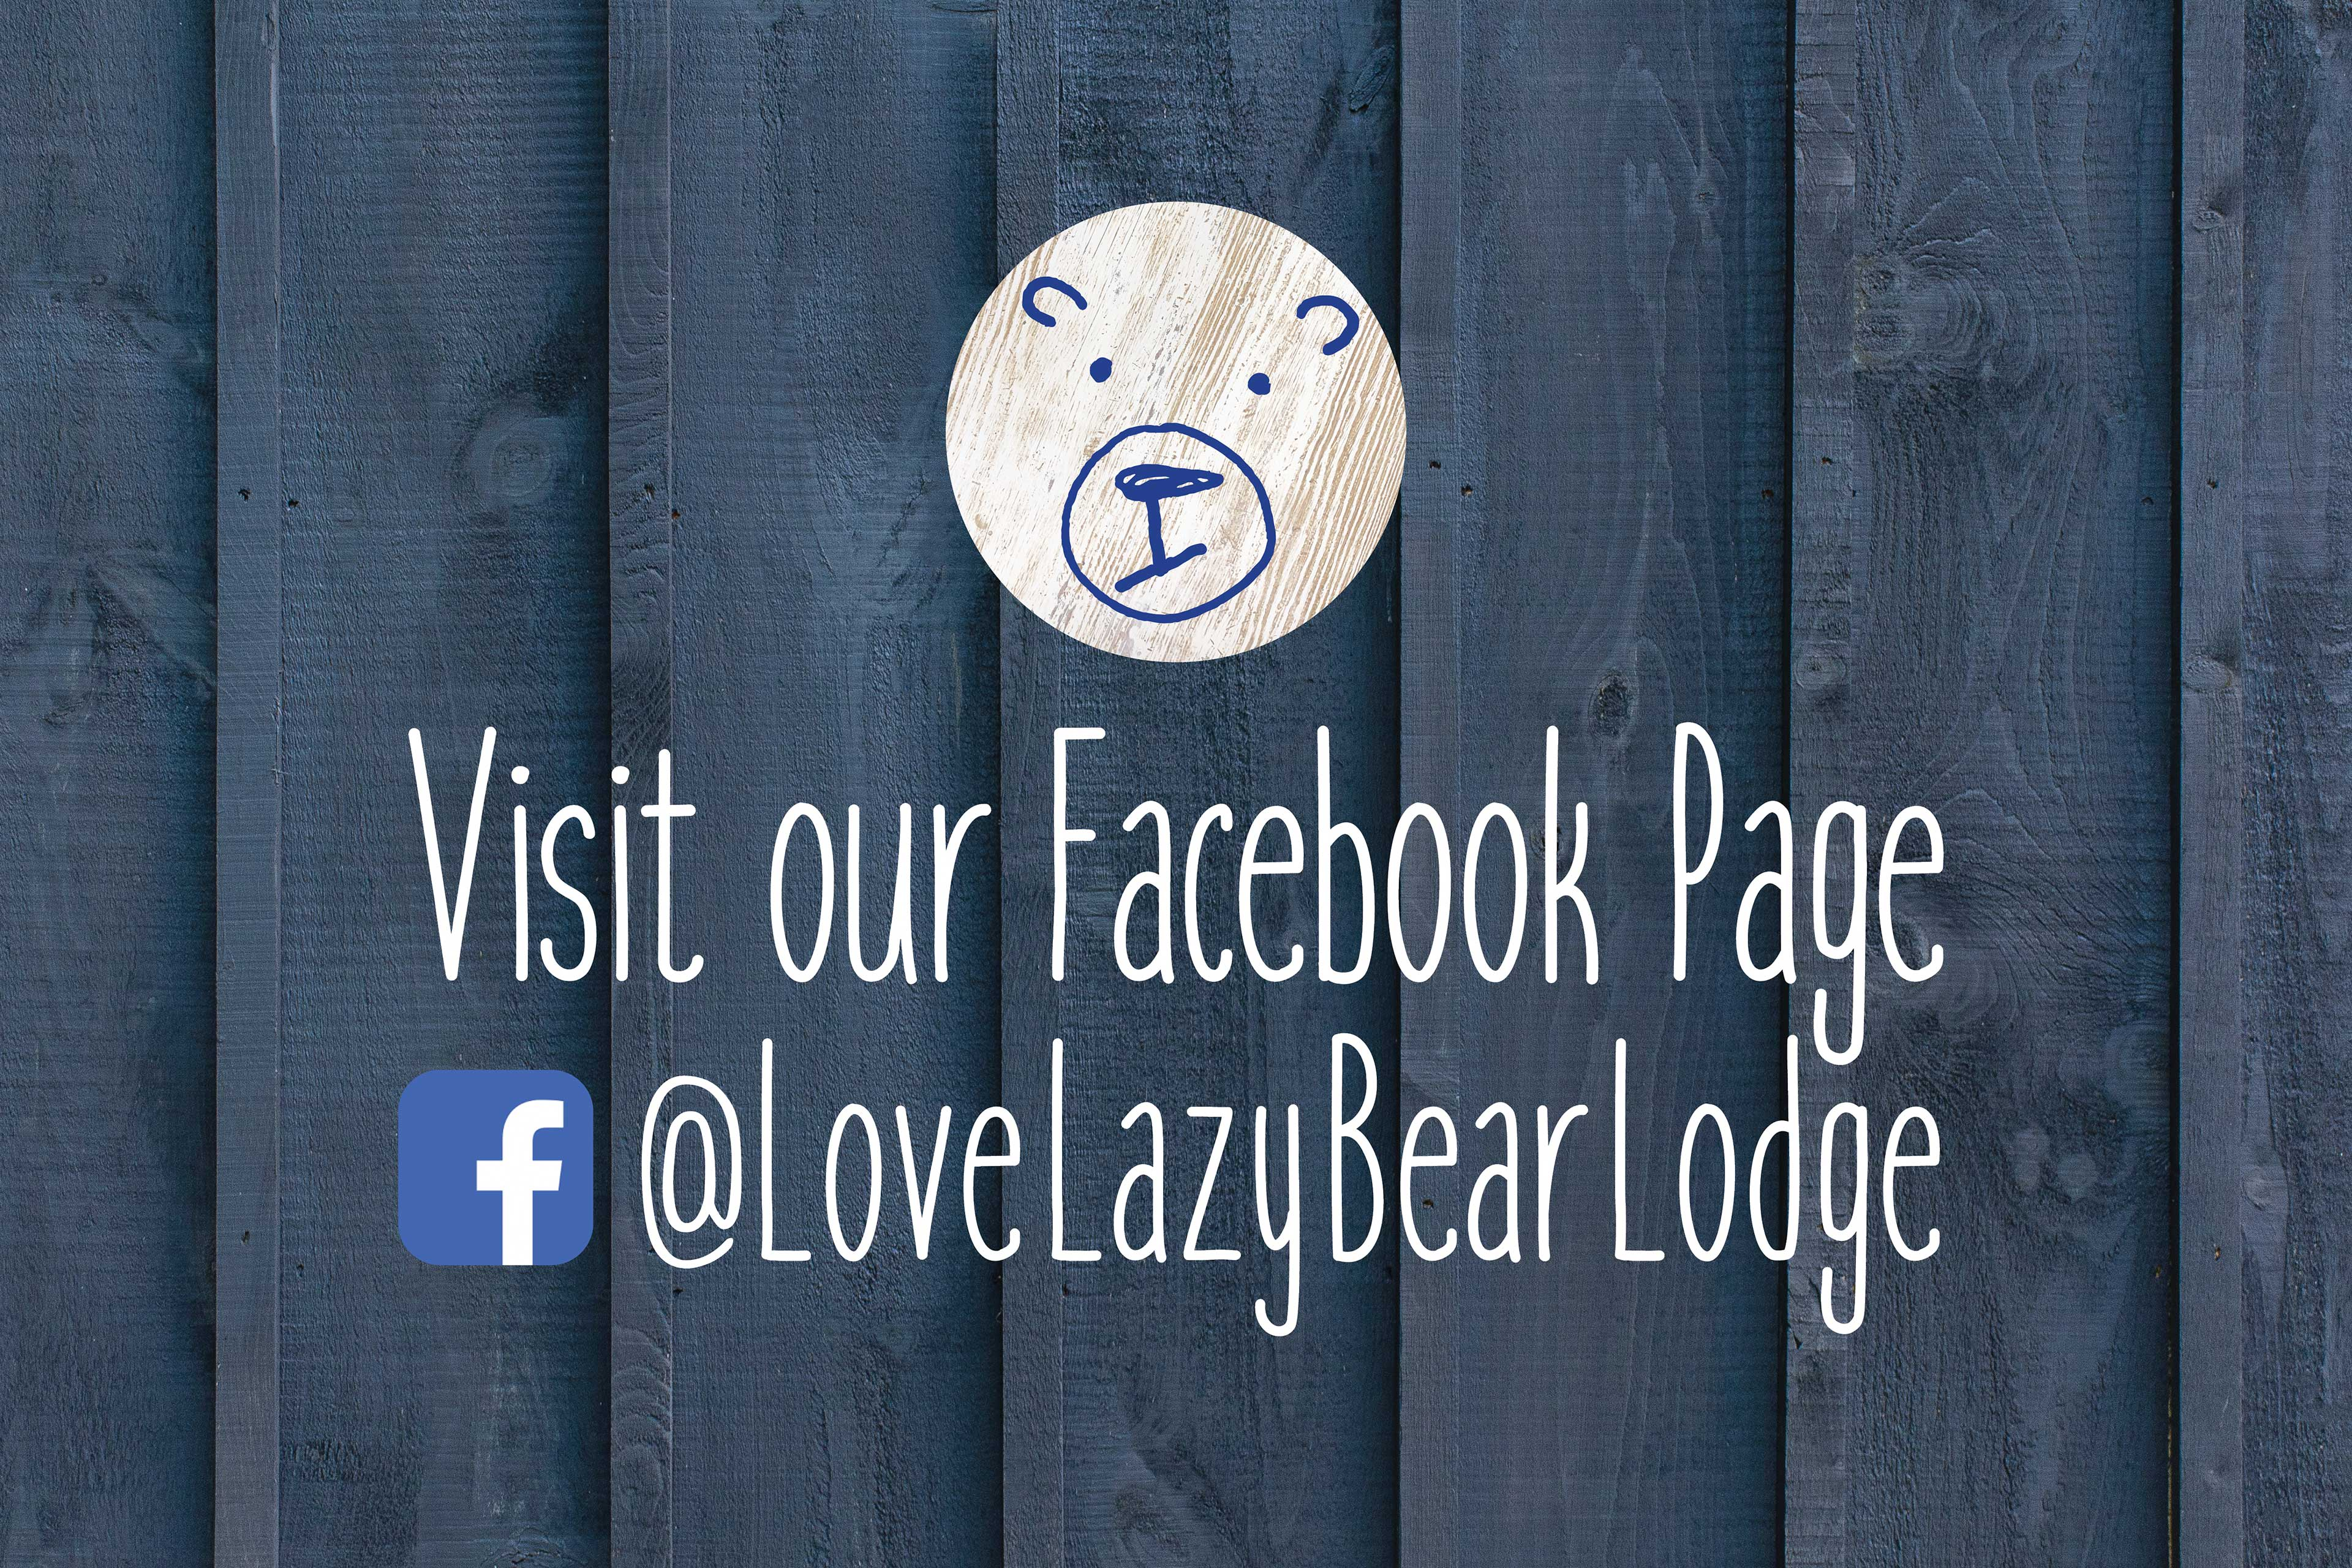 'Lazy Bear Lodge'